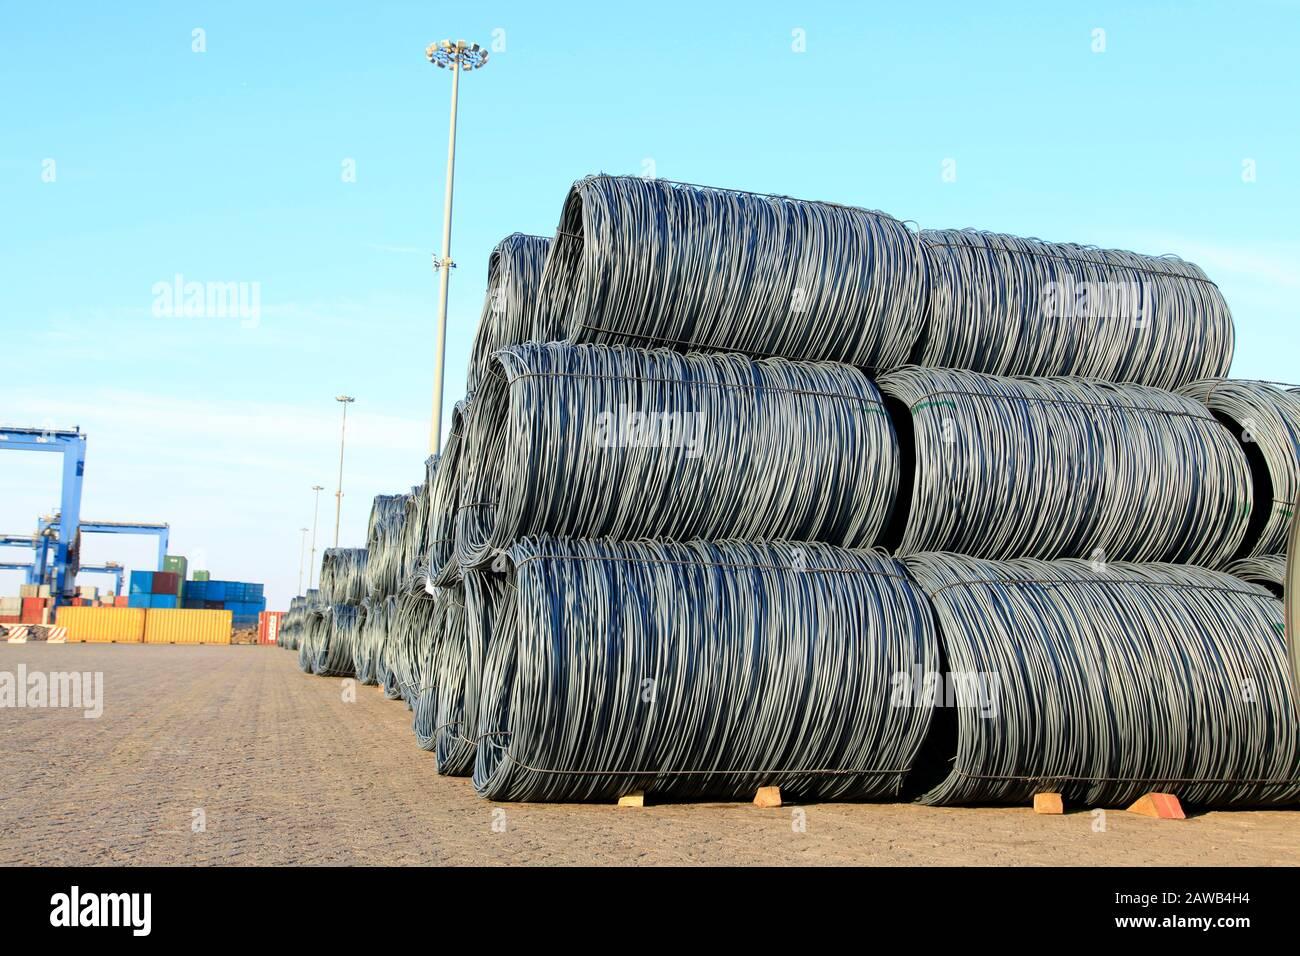 Steel wire rod Stock Photo